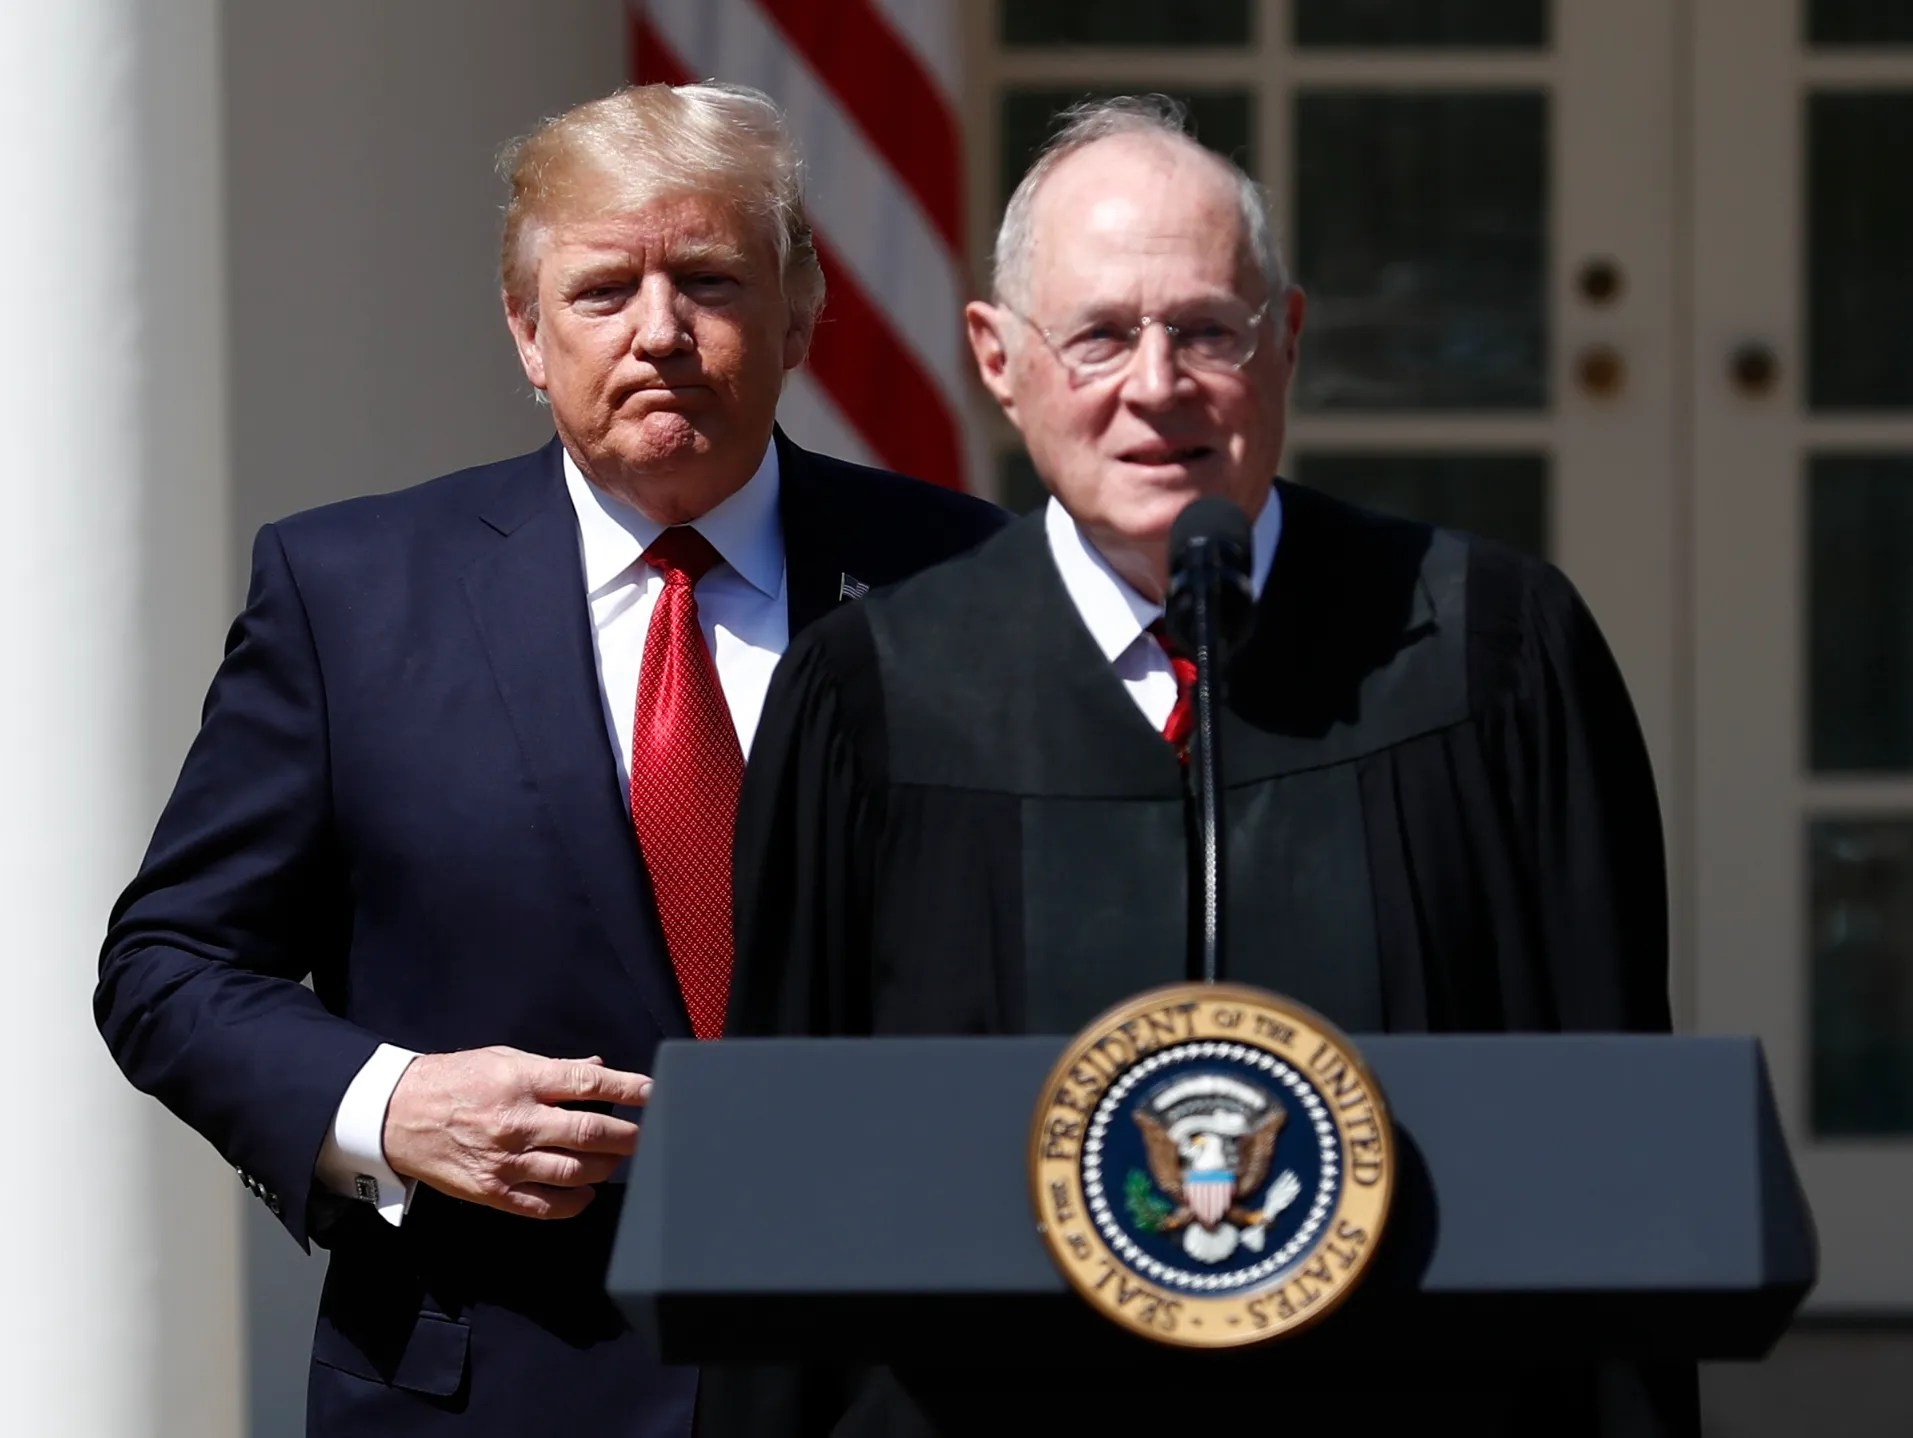 AP SUPREME COURT KENNEDY RETIRES A FILE USA DC